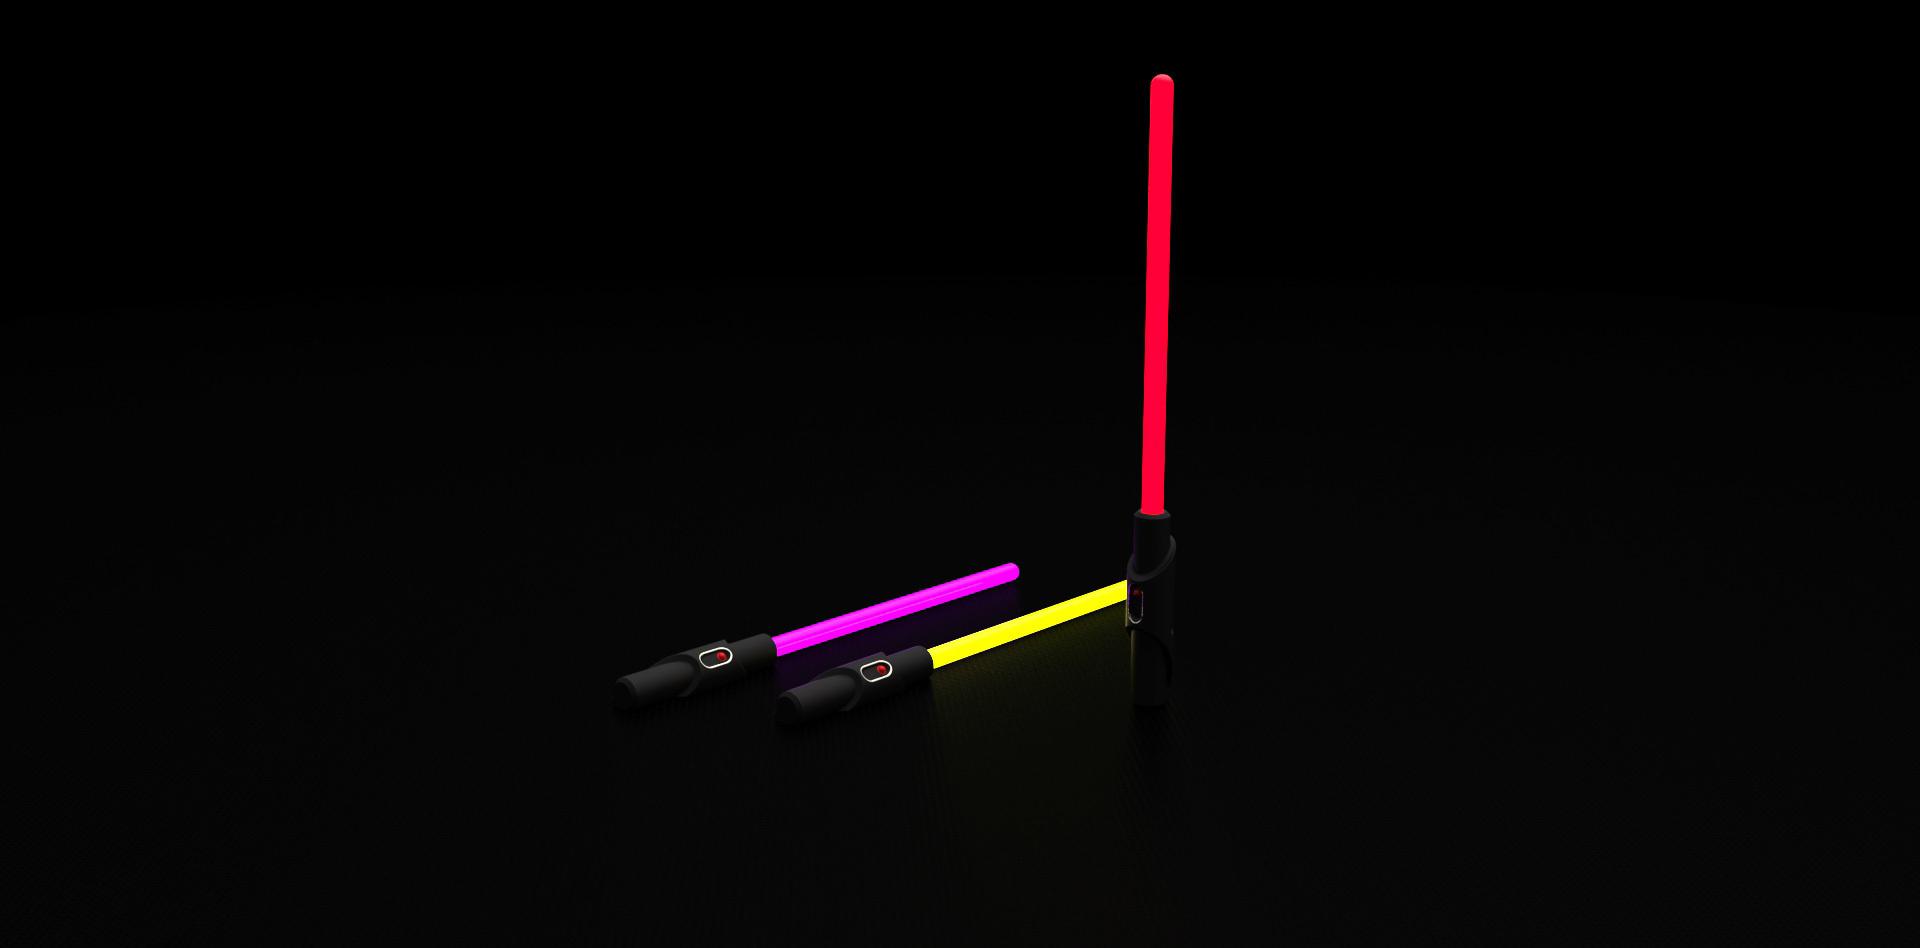 render.jpg Download free STL file Glow Stick Saber • 3D printer object, Shruikan-Arts